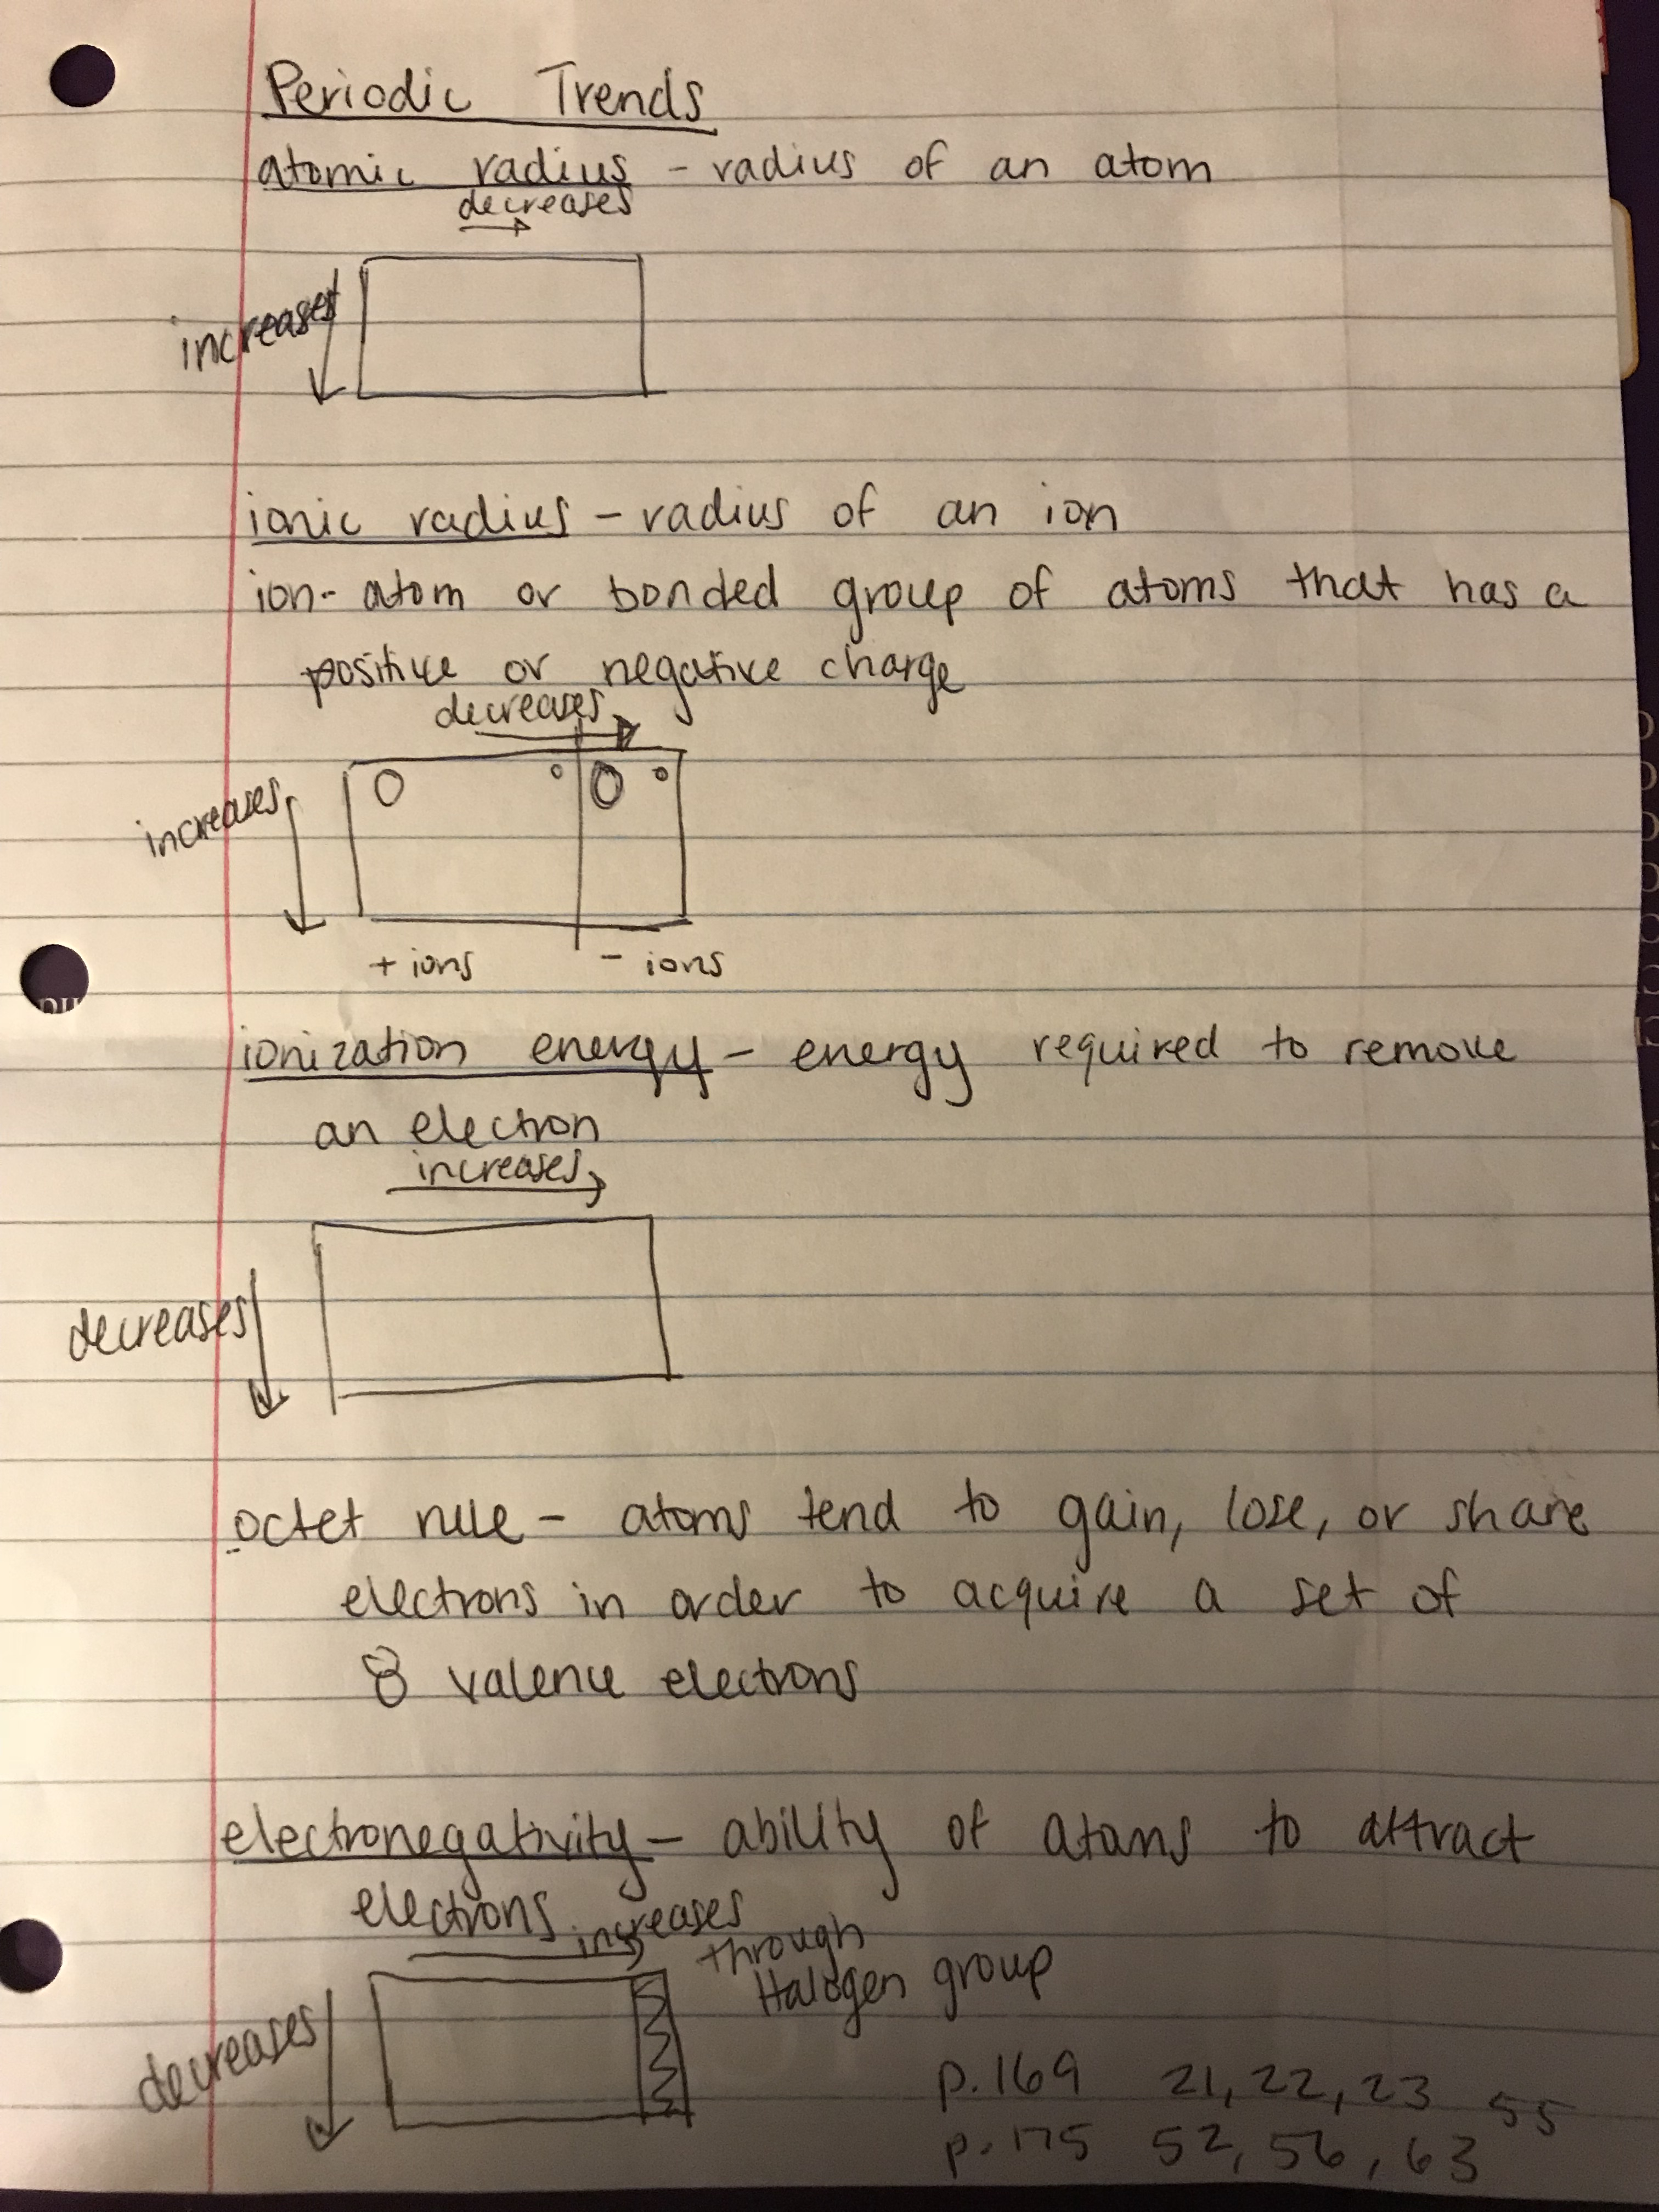 Karnath kacy science chemistry periodic trends notes urtaz Images